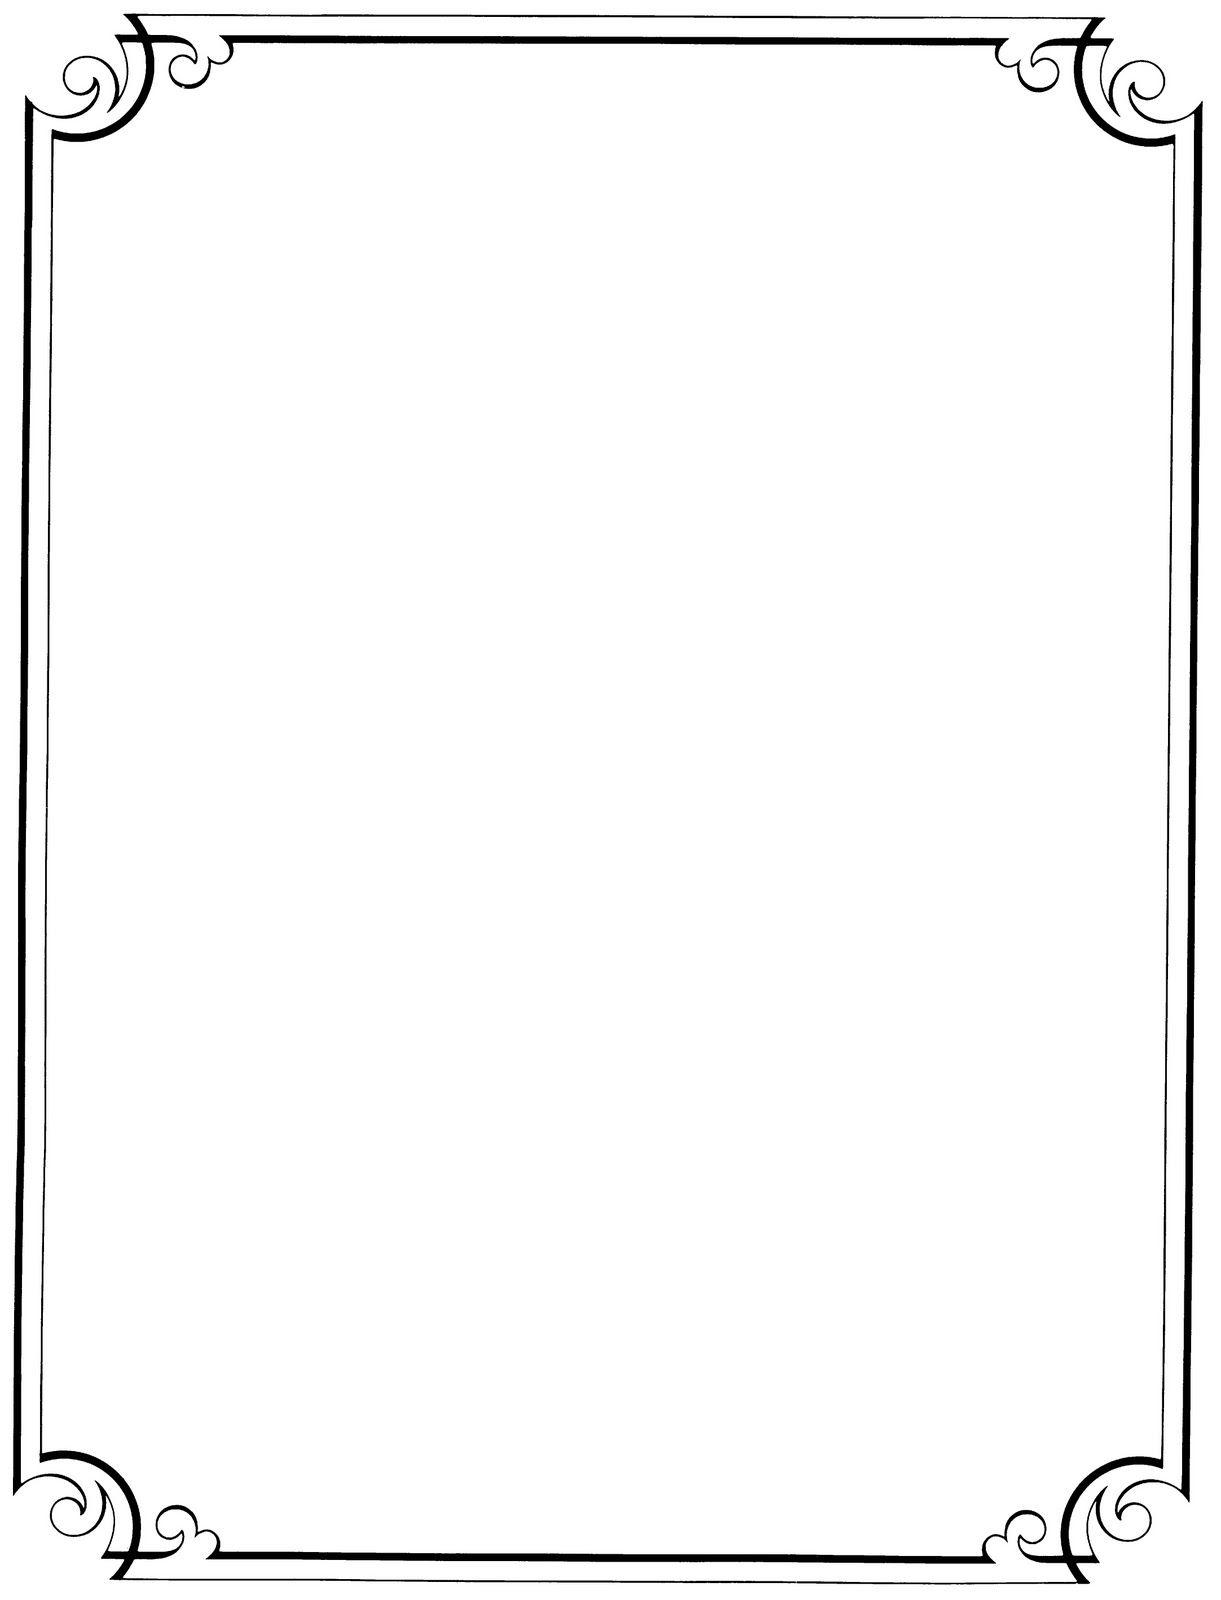 Free Printable Clip Art Borders |  : Free Vintage Clip Art - Free Printable Letterhead Borders